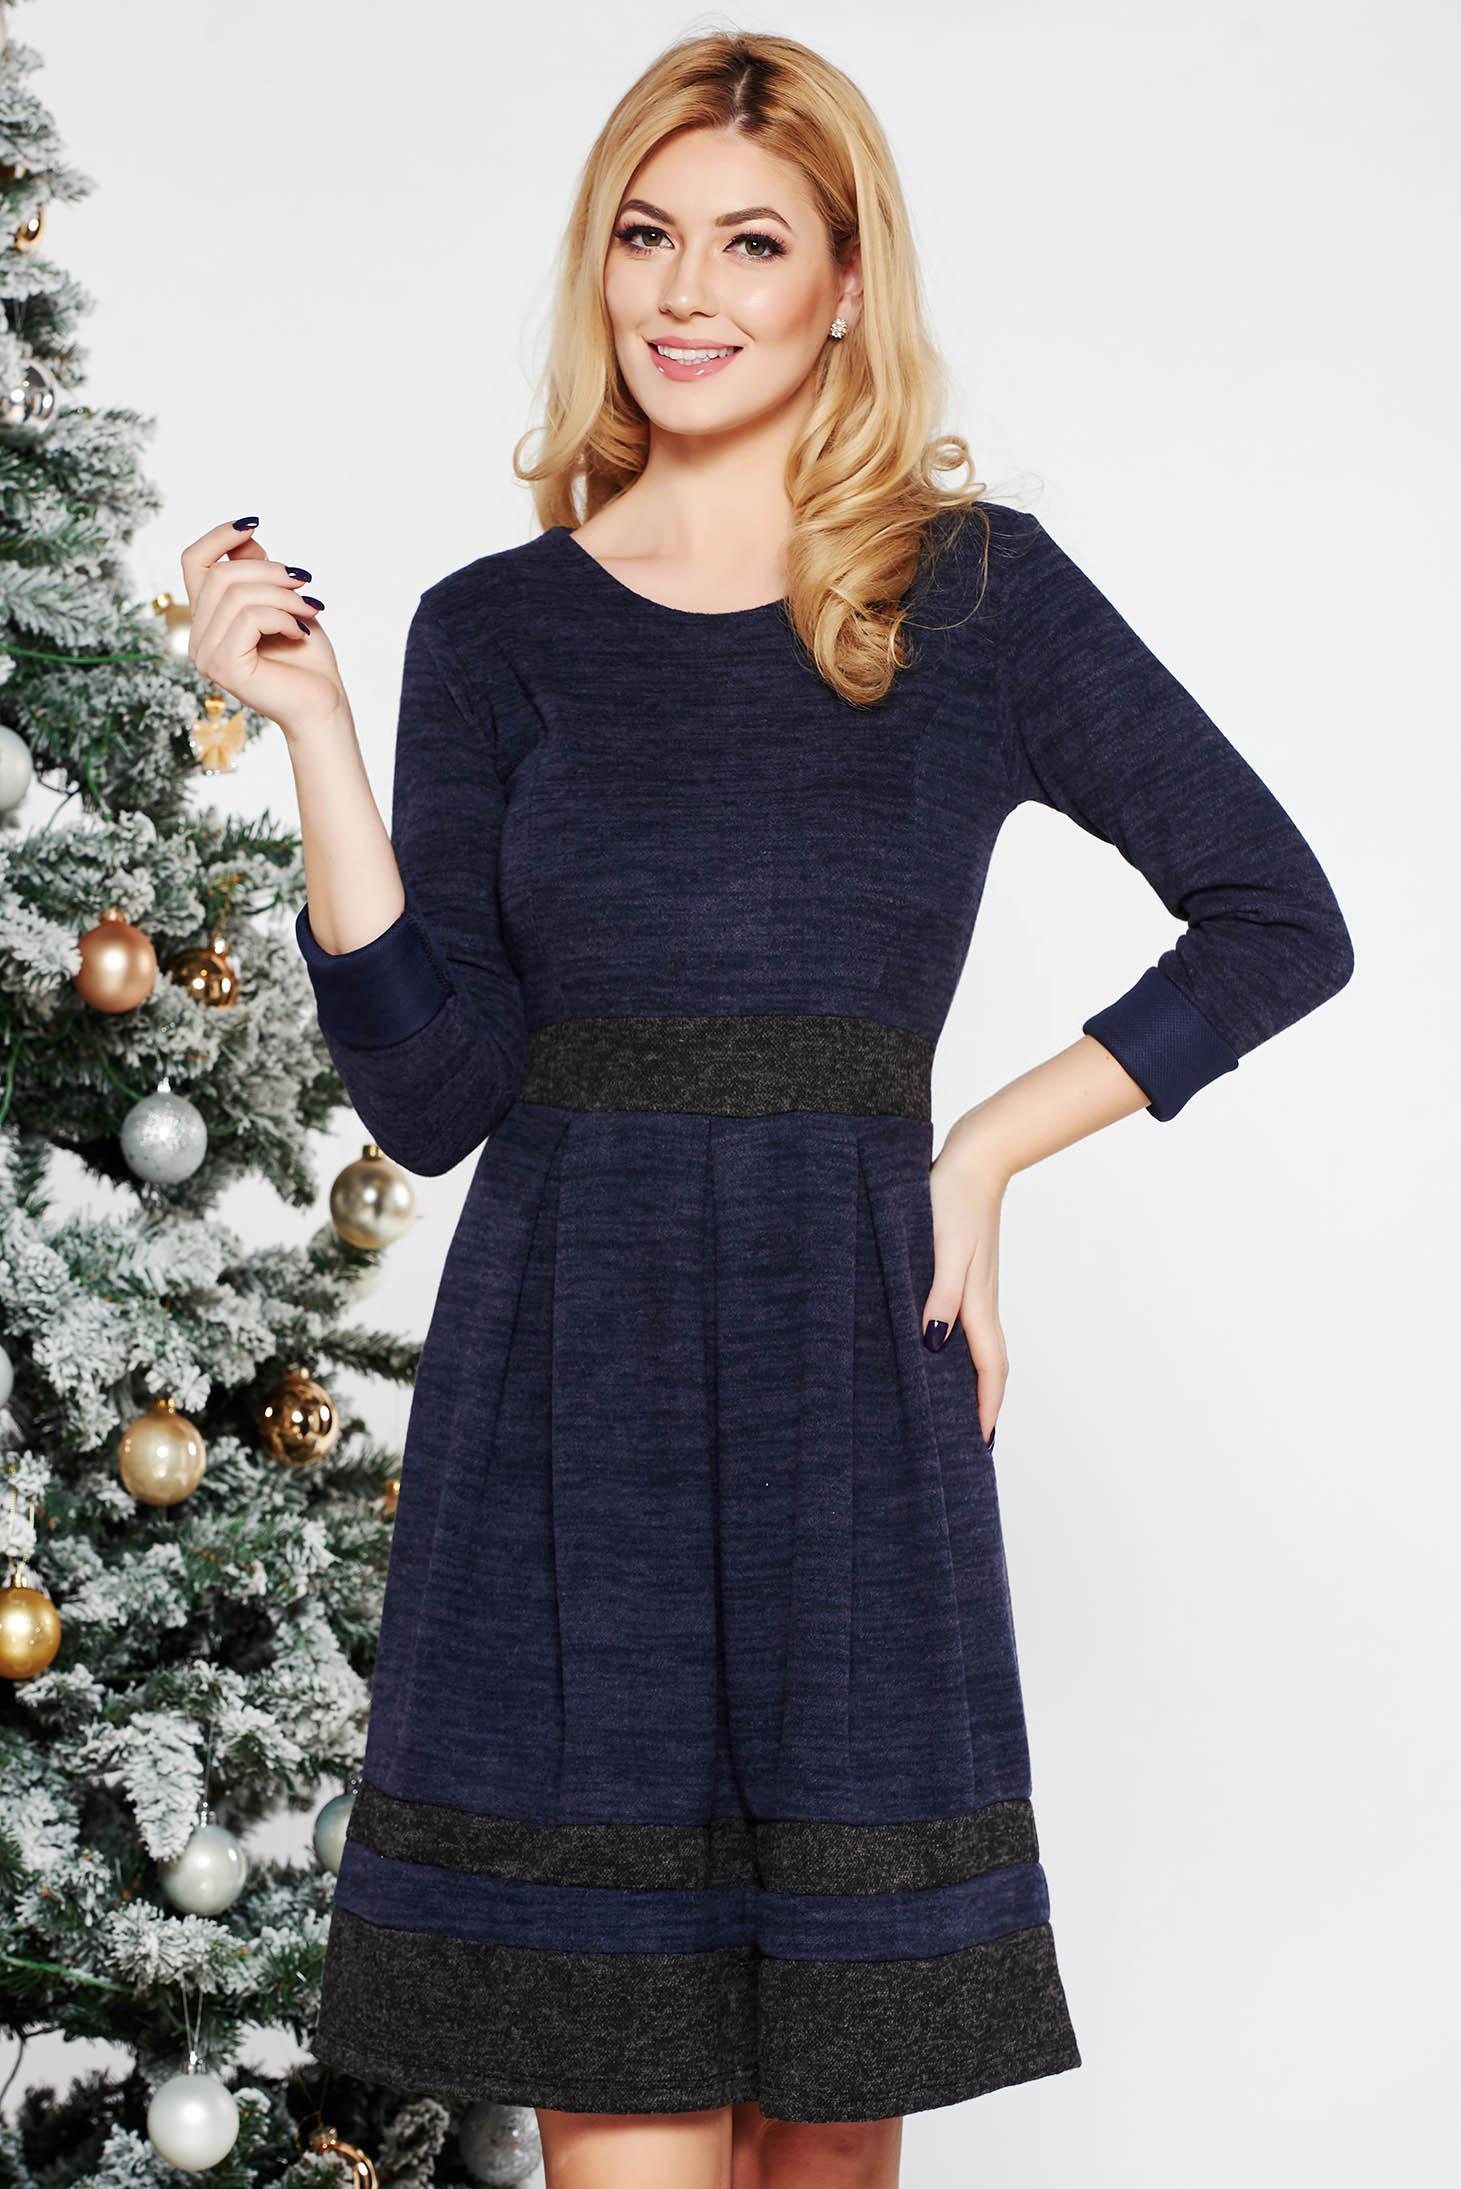 Rochie albastra-inchis de zi in clos din material moale tricotat cu maneci lungi